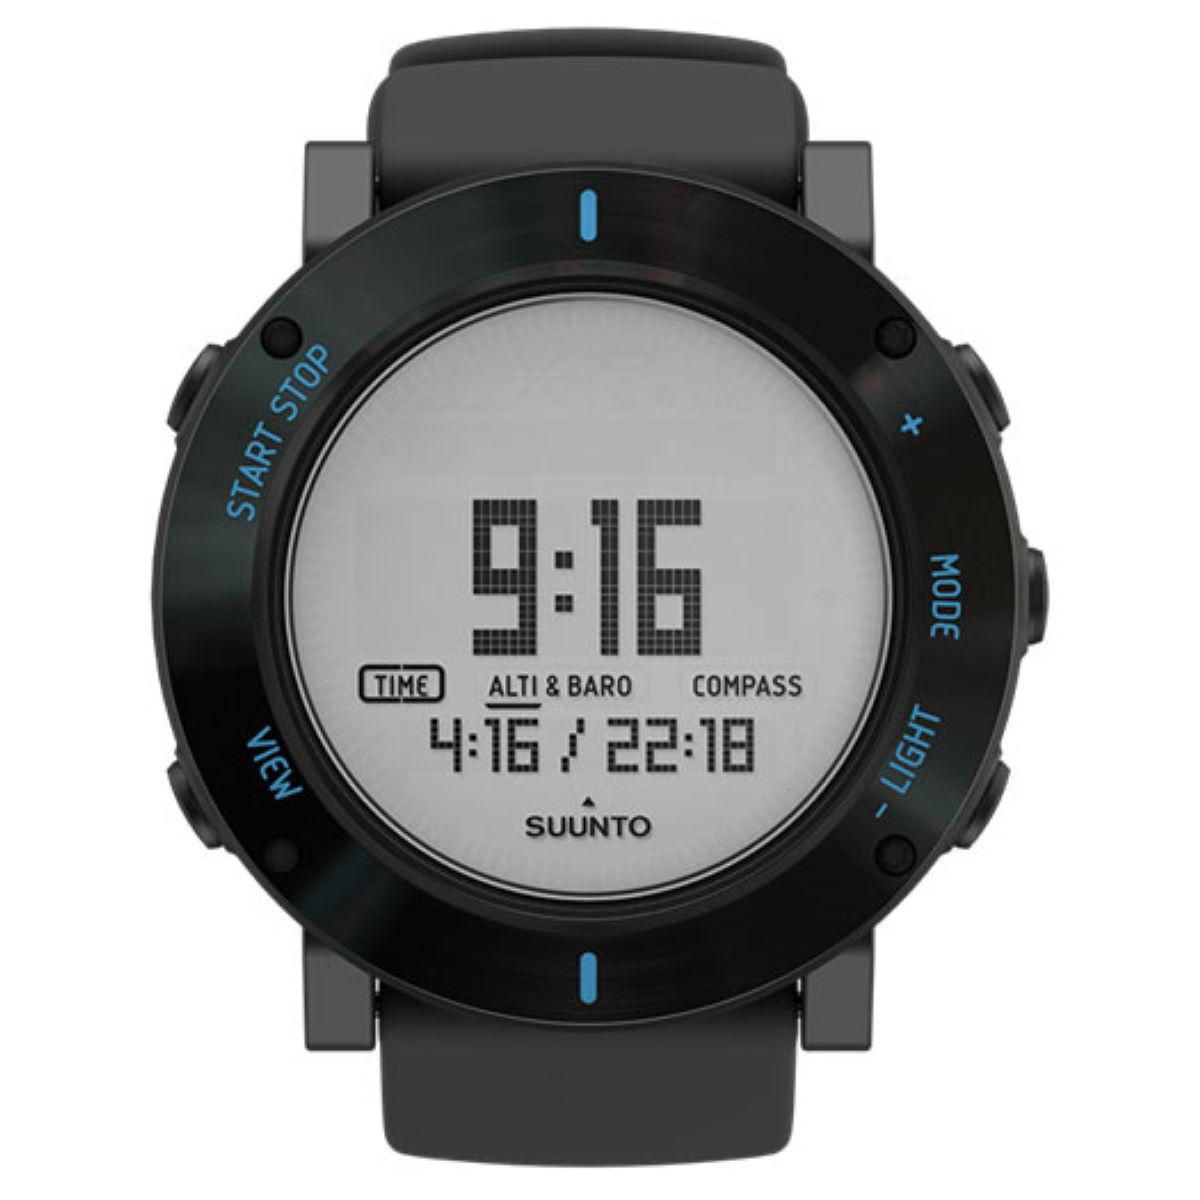 Reloj deportivo Suunto Core Crush - Relojes deportivos